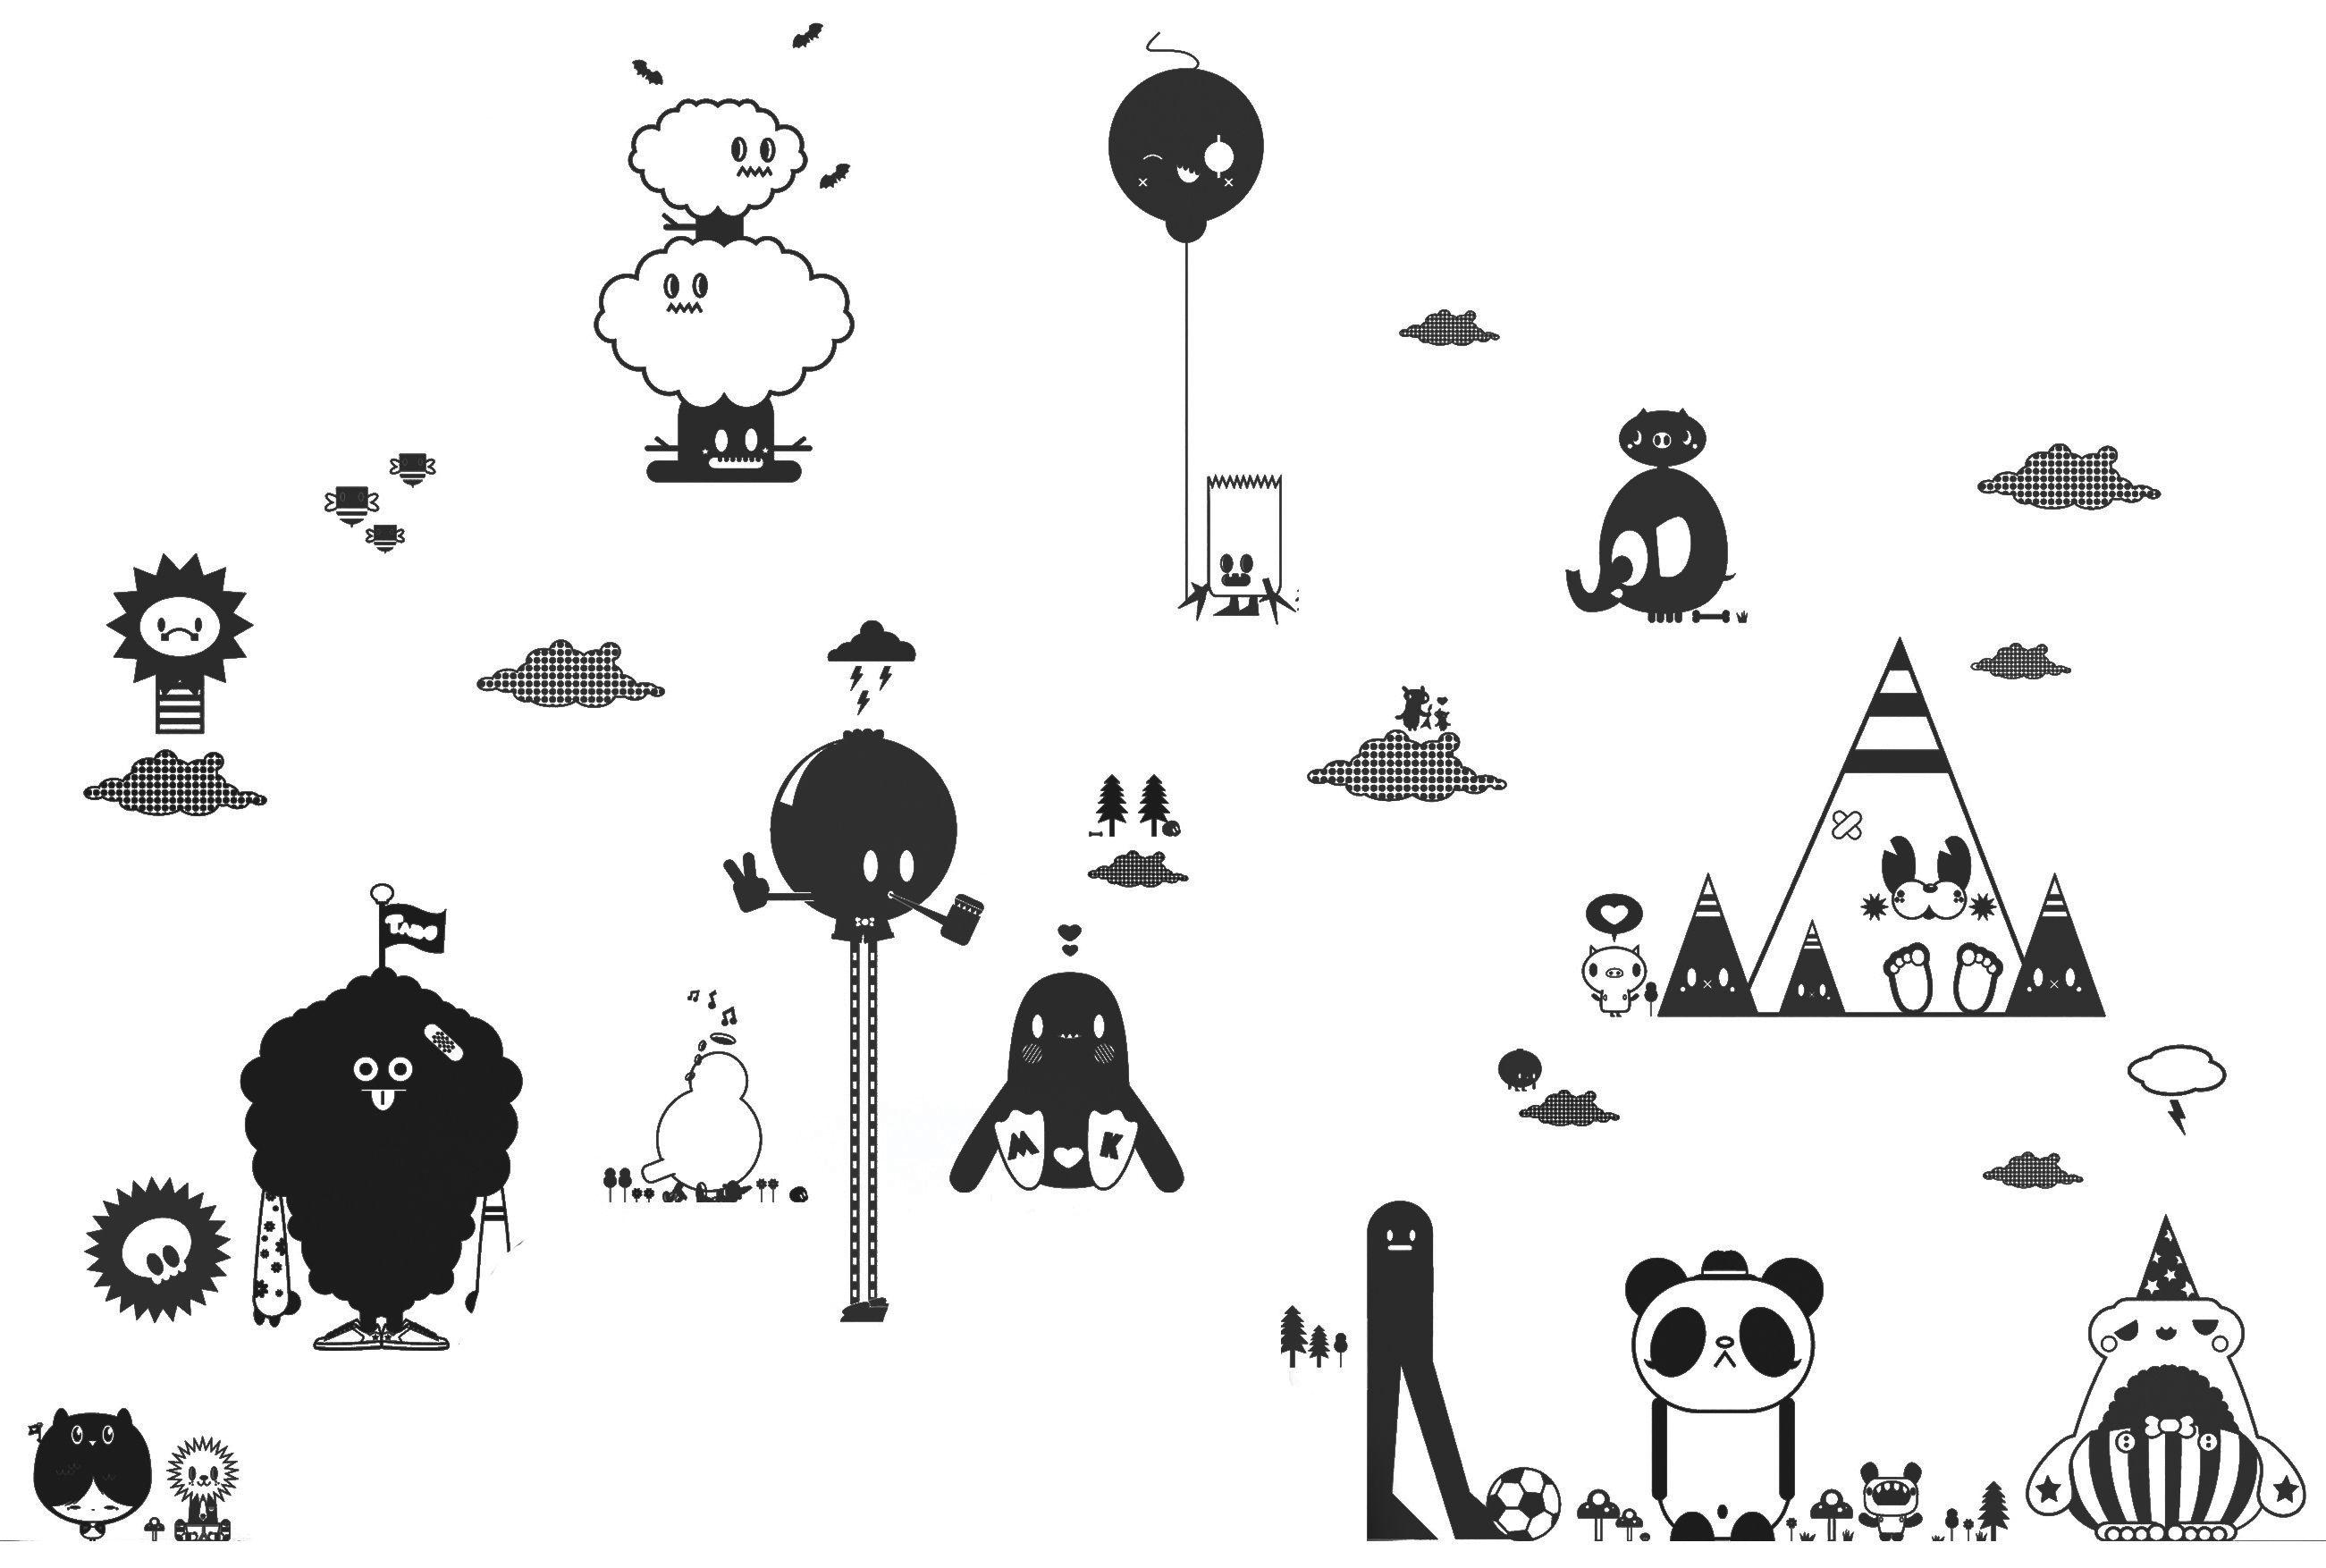 Decoration - Wallpaper & Wall Stickers - Friends 2 Black Sticker by Domestic - Black - Vinal